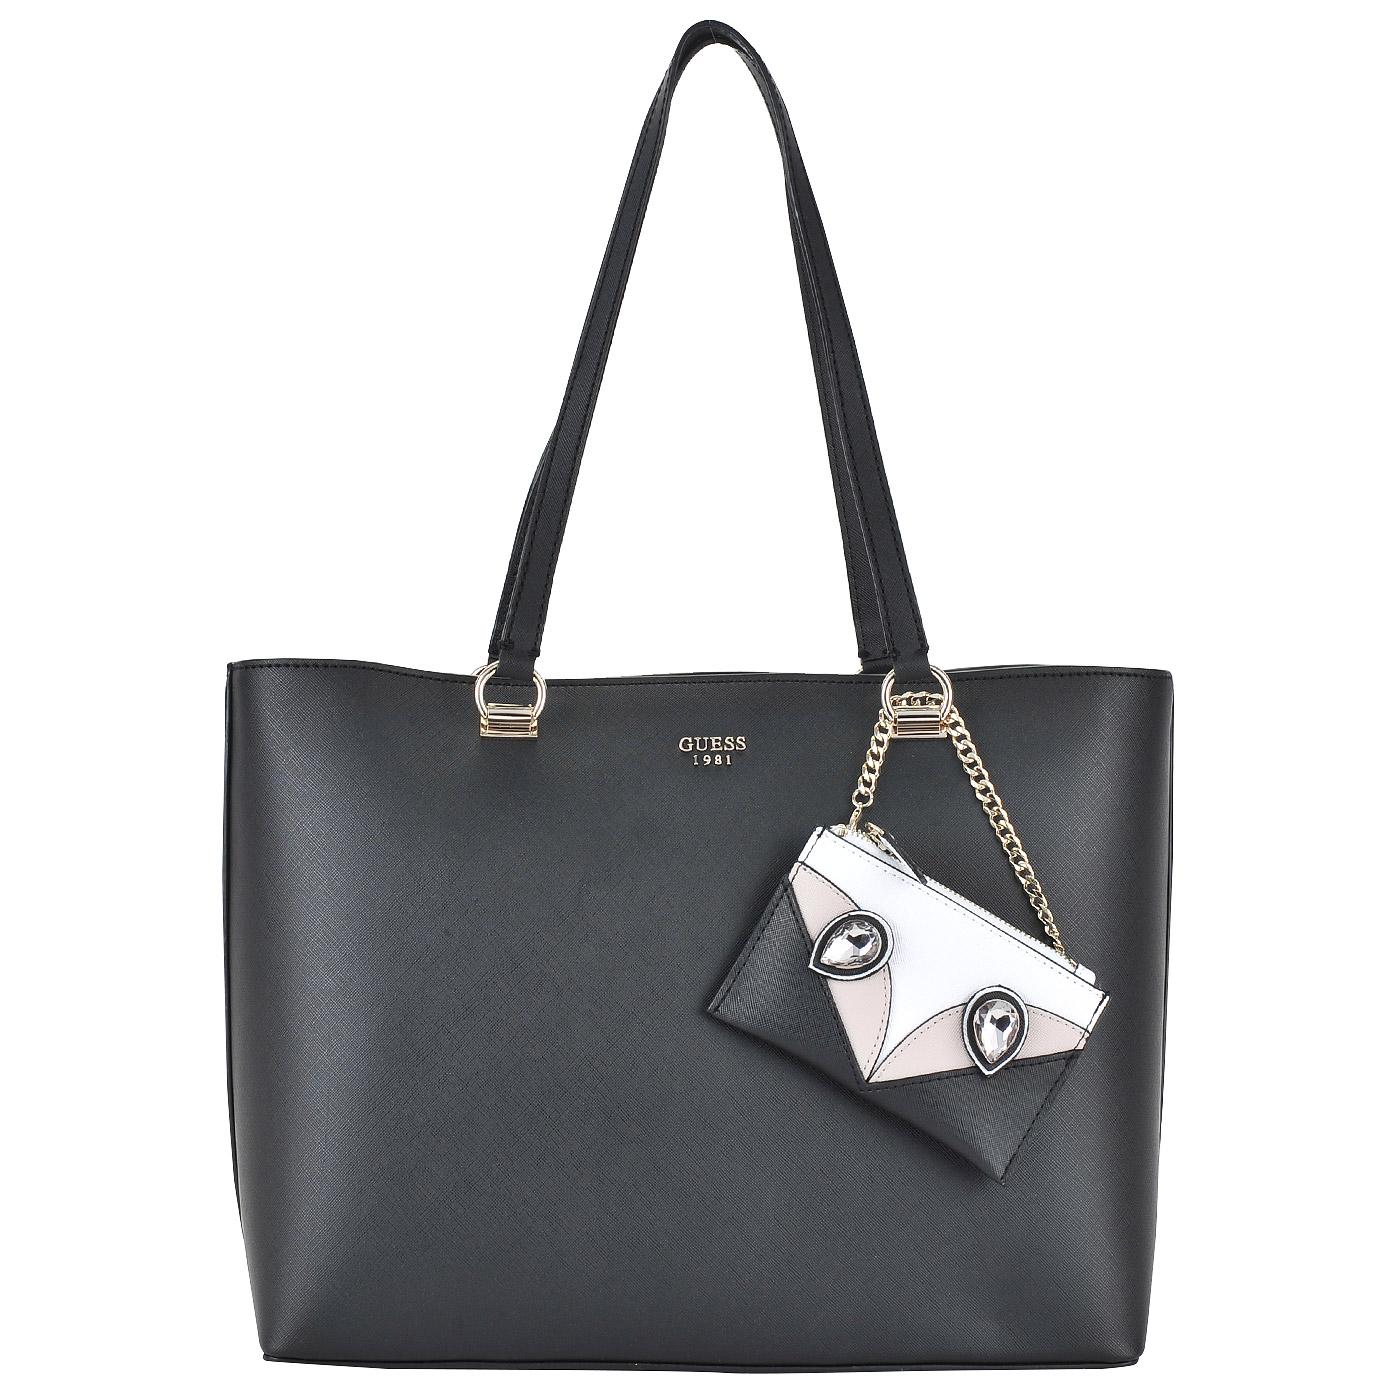 307576e0bfe1 Вместительная женская сумка с длинными ручками Guess Kizzy HWVG64 ...